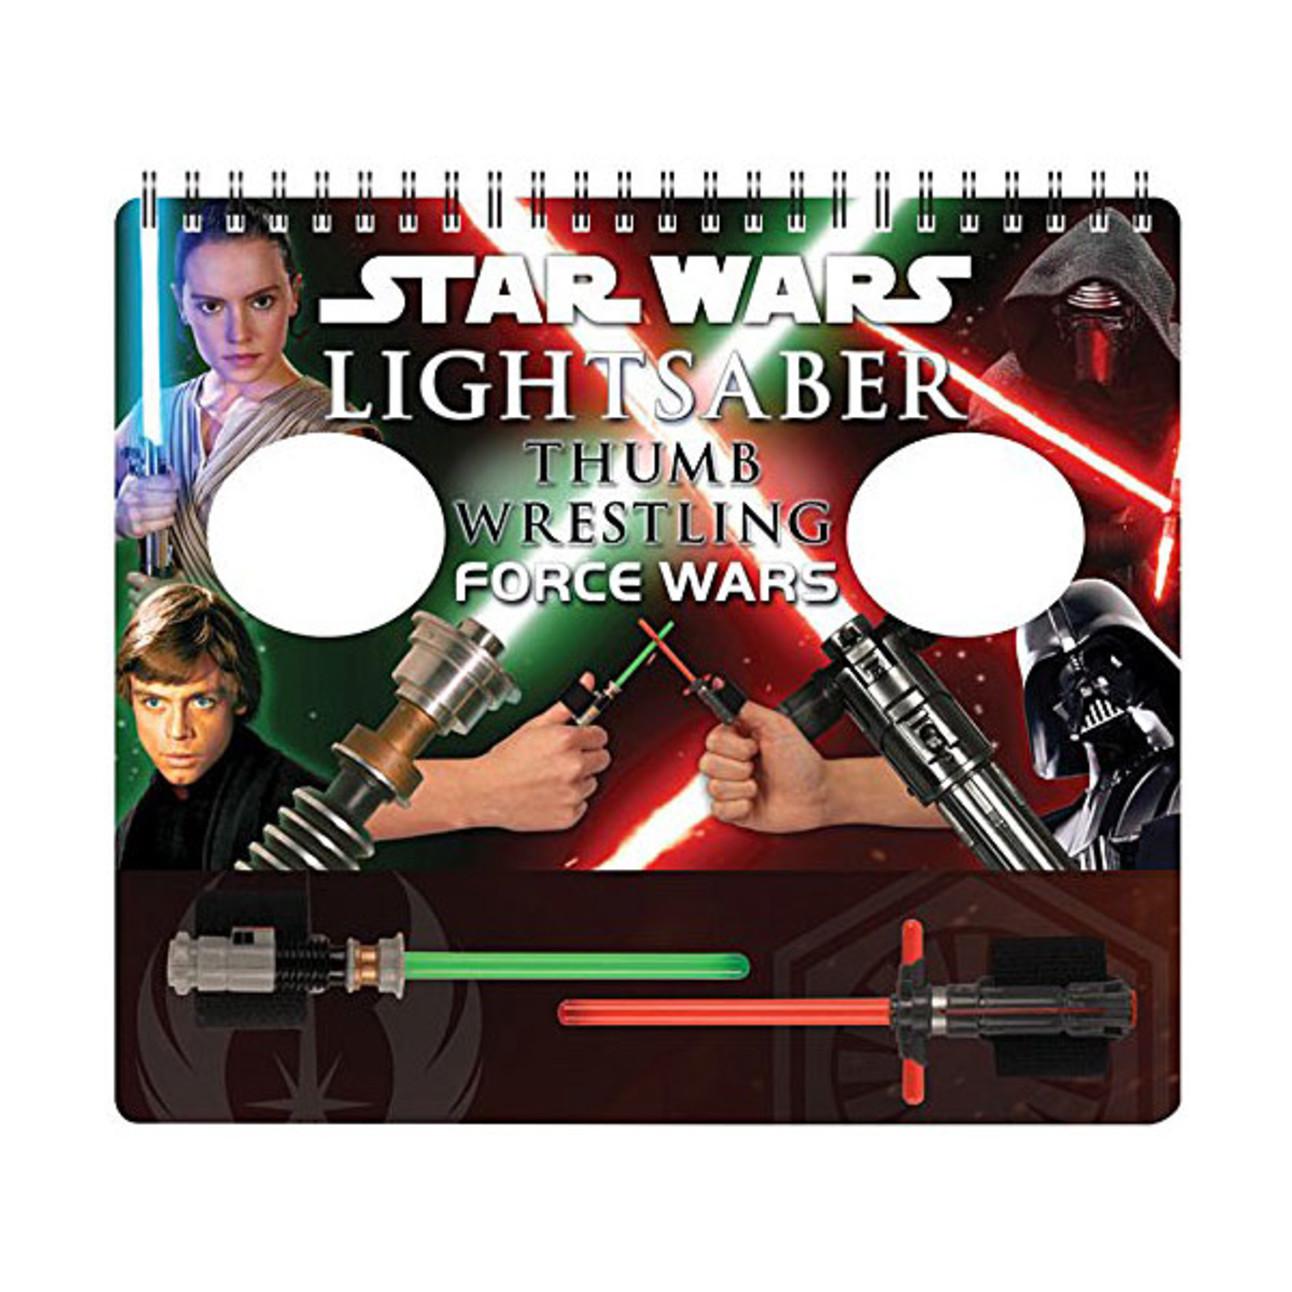 jiuv_star_wars_lightsaber_thumb_wrestling_force_wars.jpg